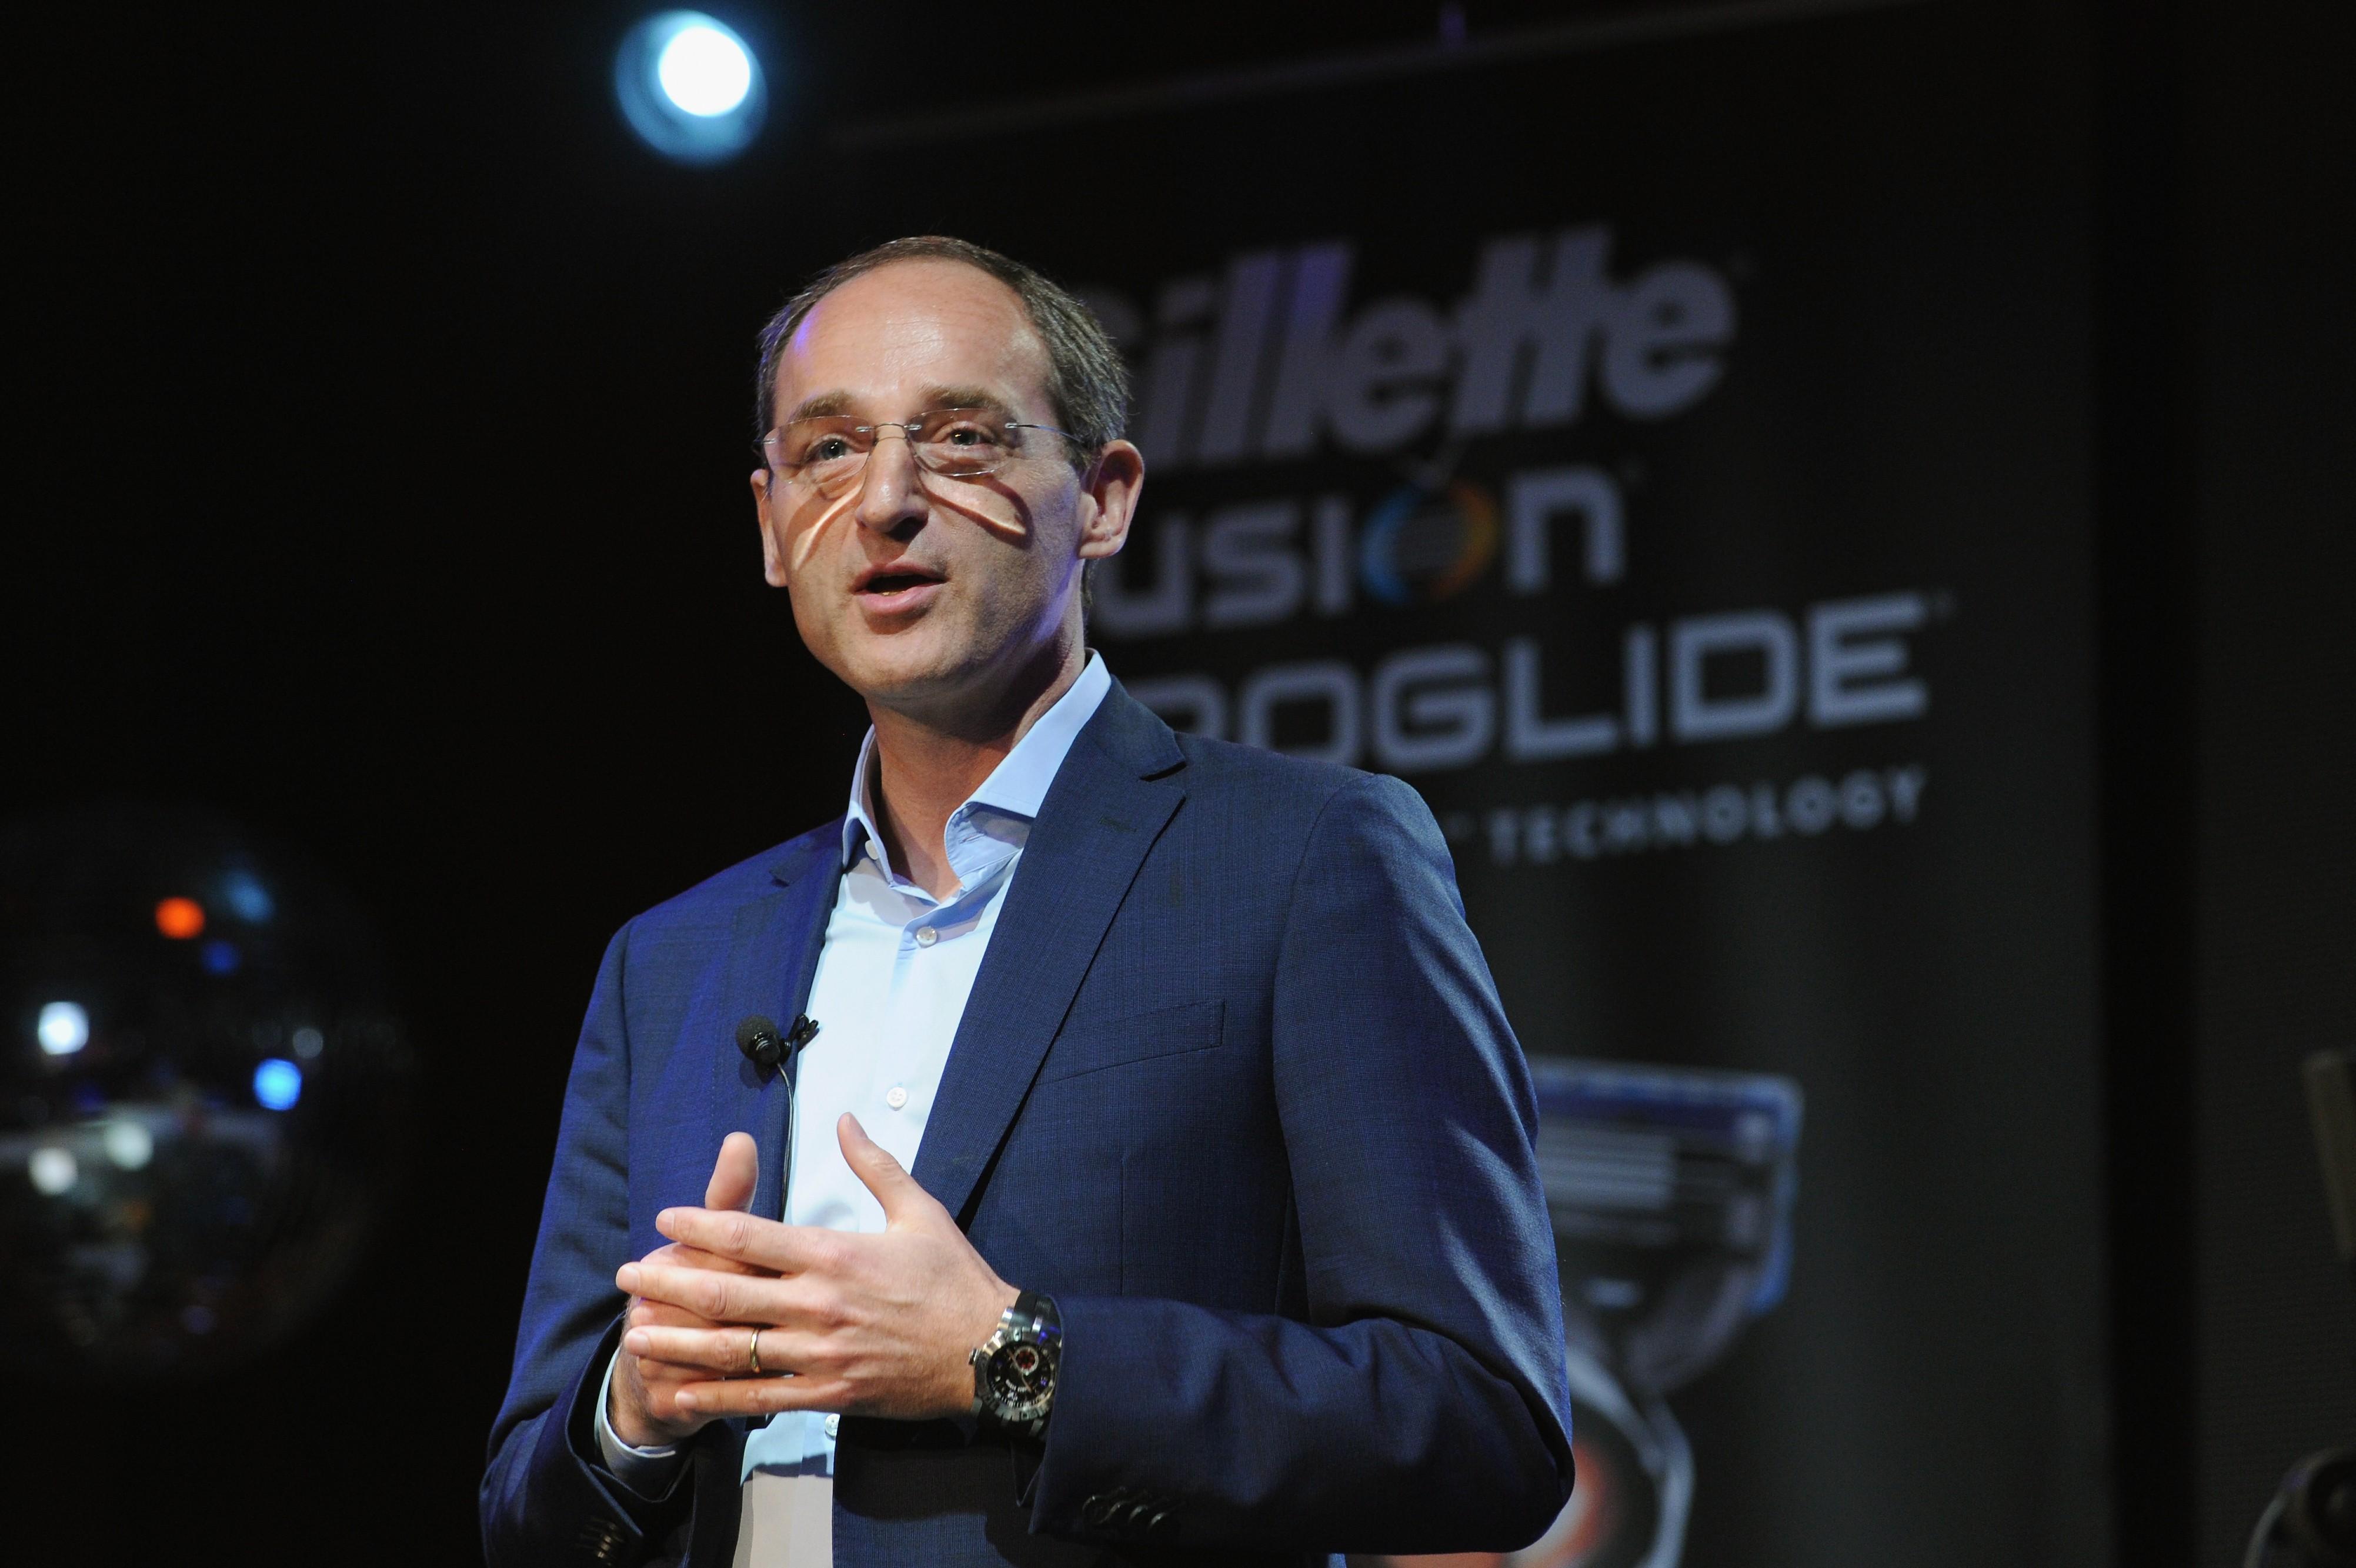 Patrice Louvet, homem de poder da Procter & Gamble, é o novo escolhido da Ralph Lauren (Foto: Getty Images/ Craig Barritt )